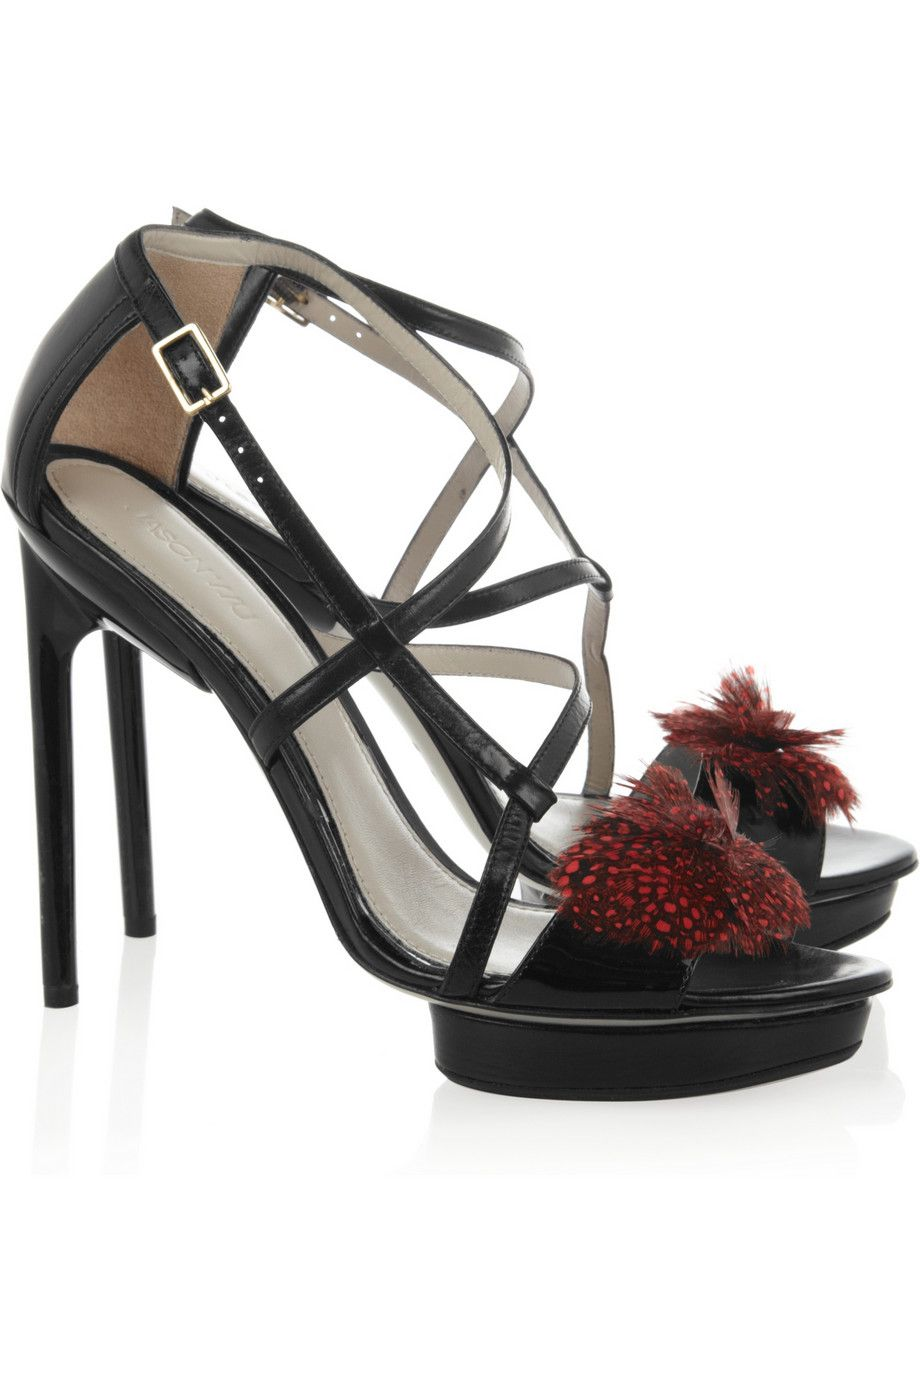 Jason Wu Leather Sandals Lw9XTt9U52